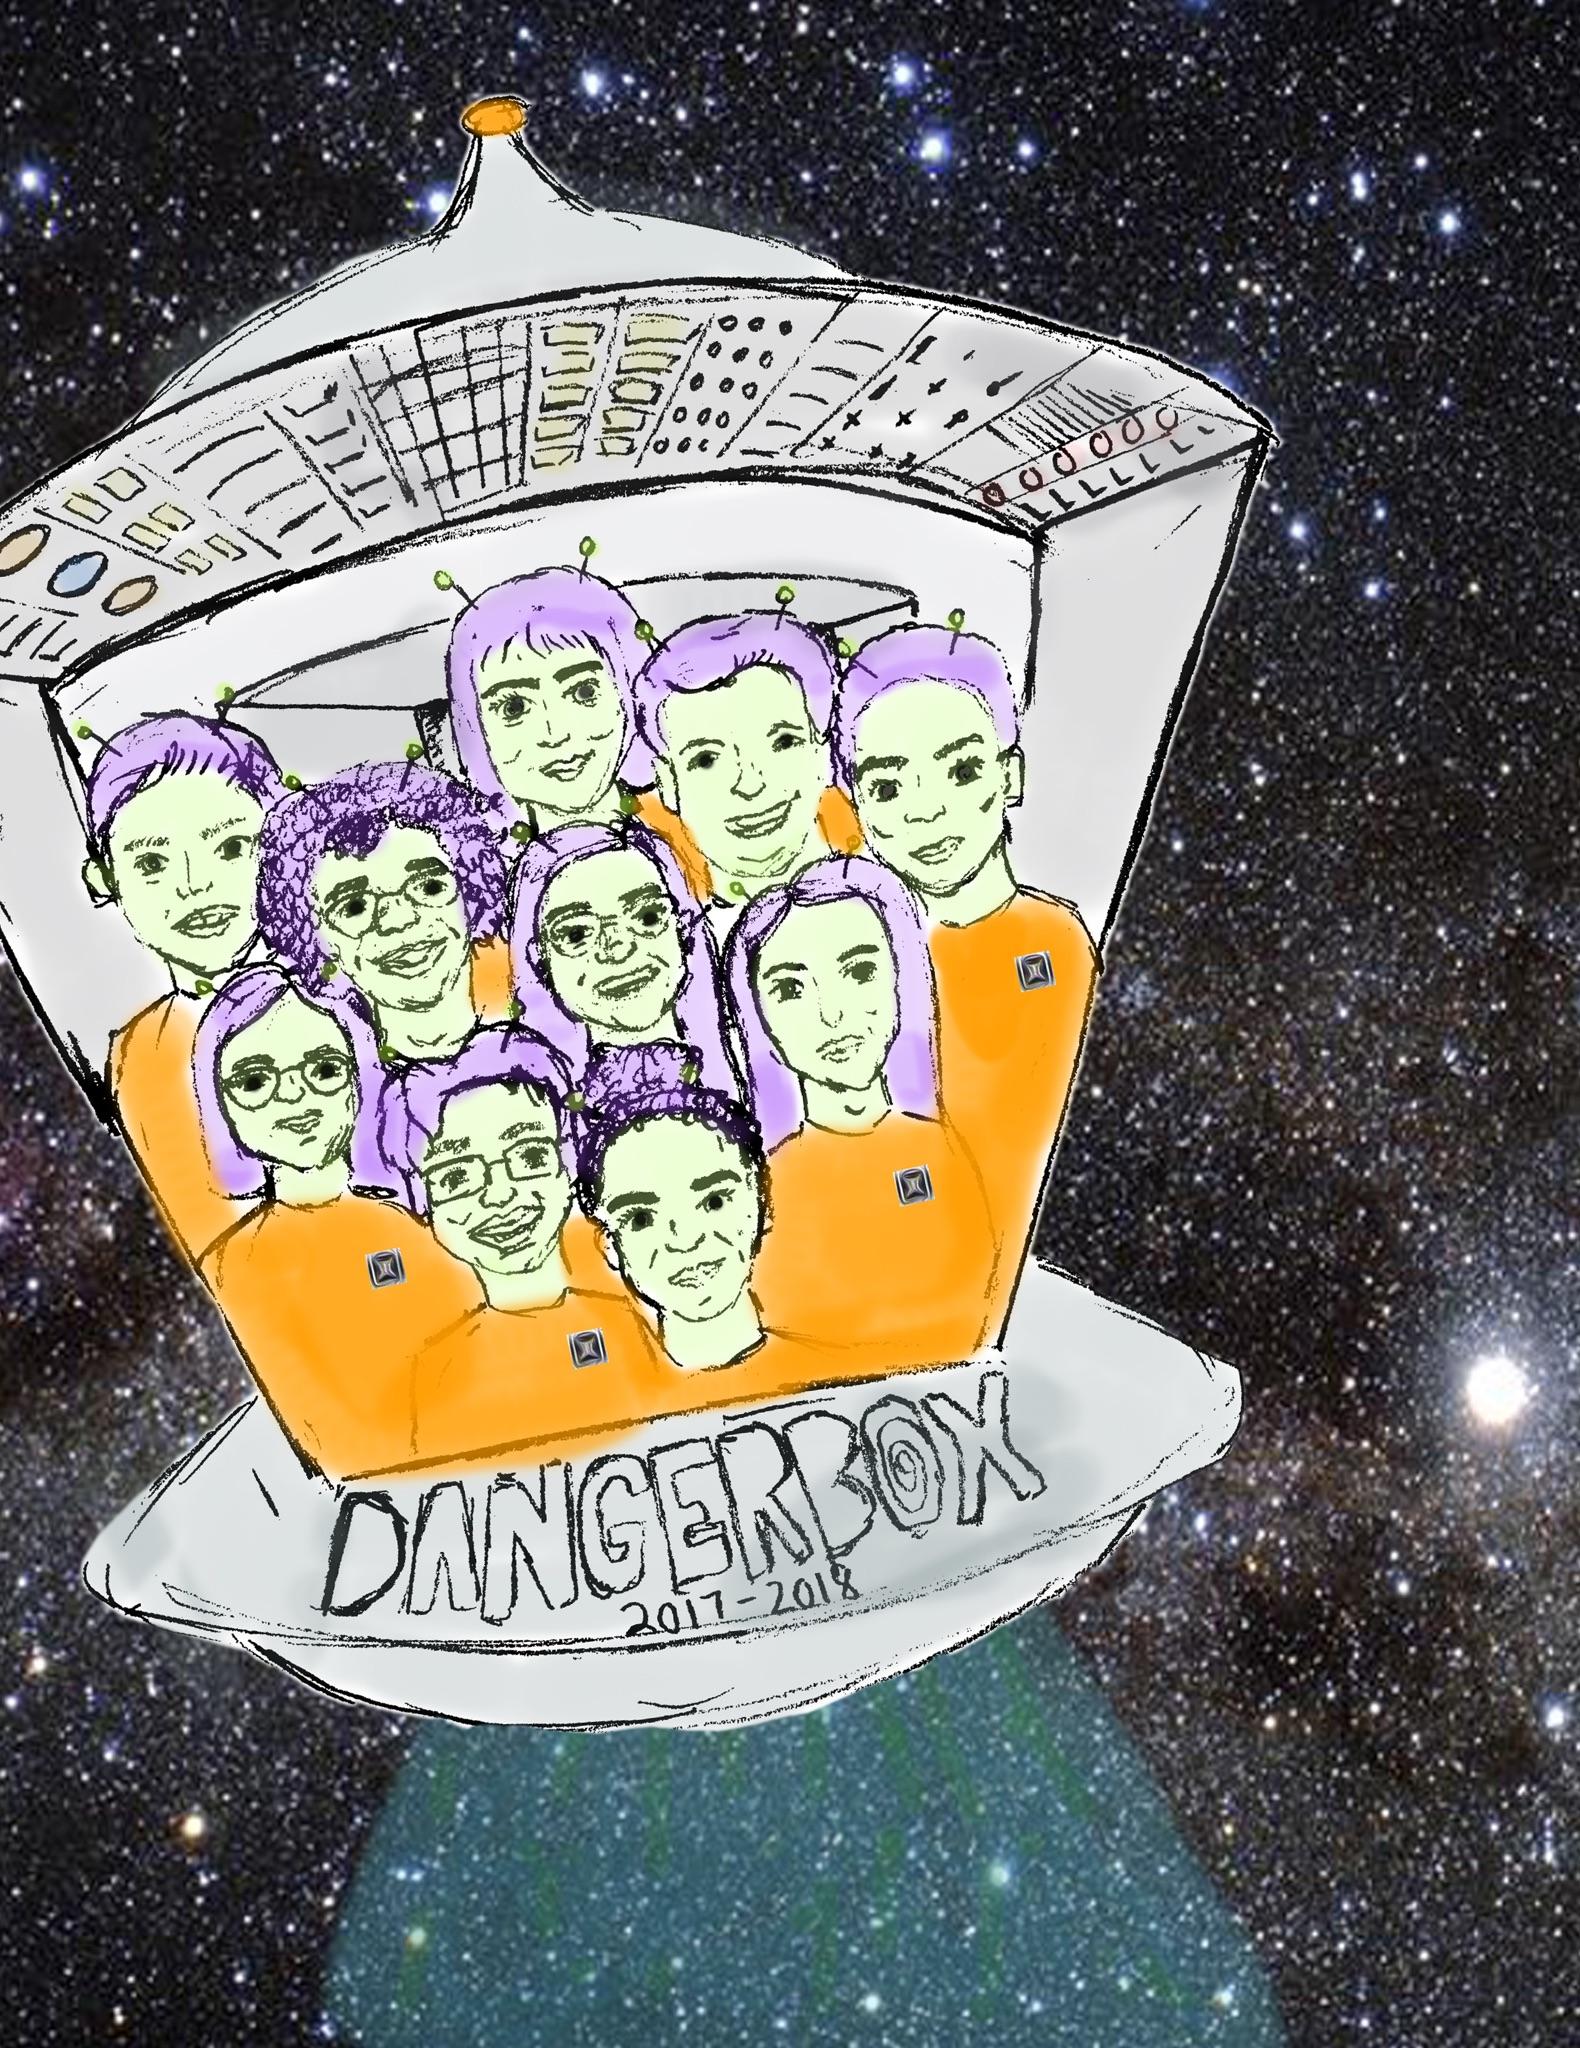 Dangerbox 2017-2018